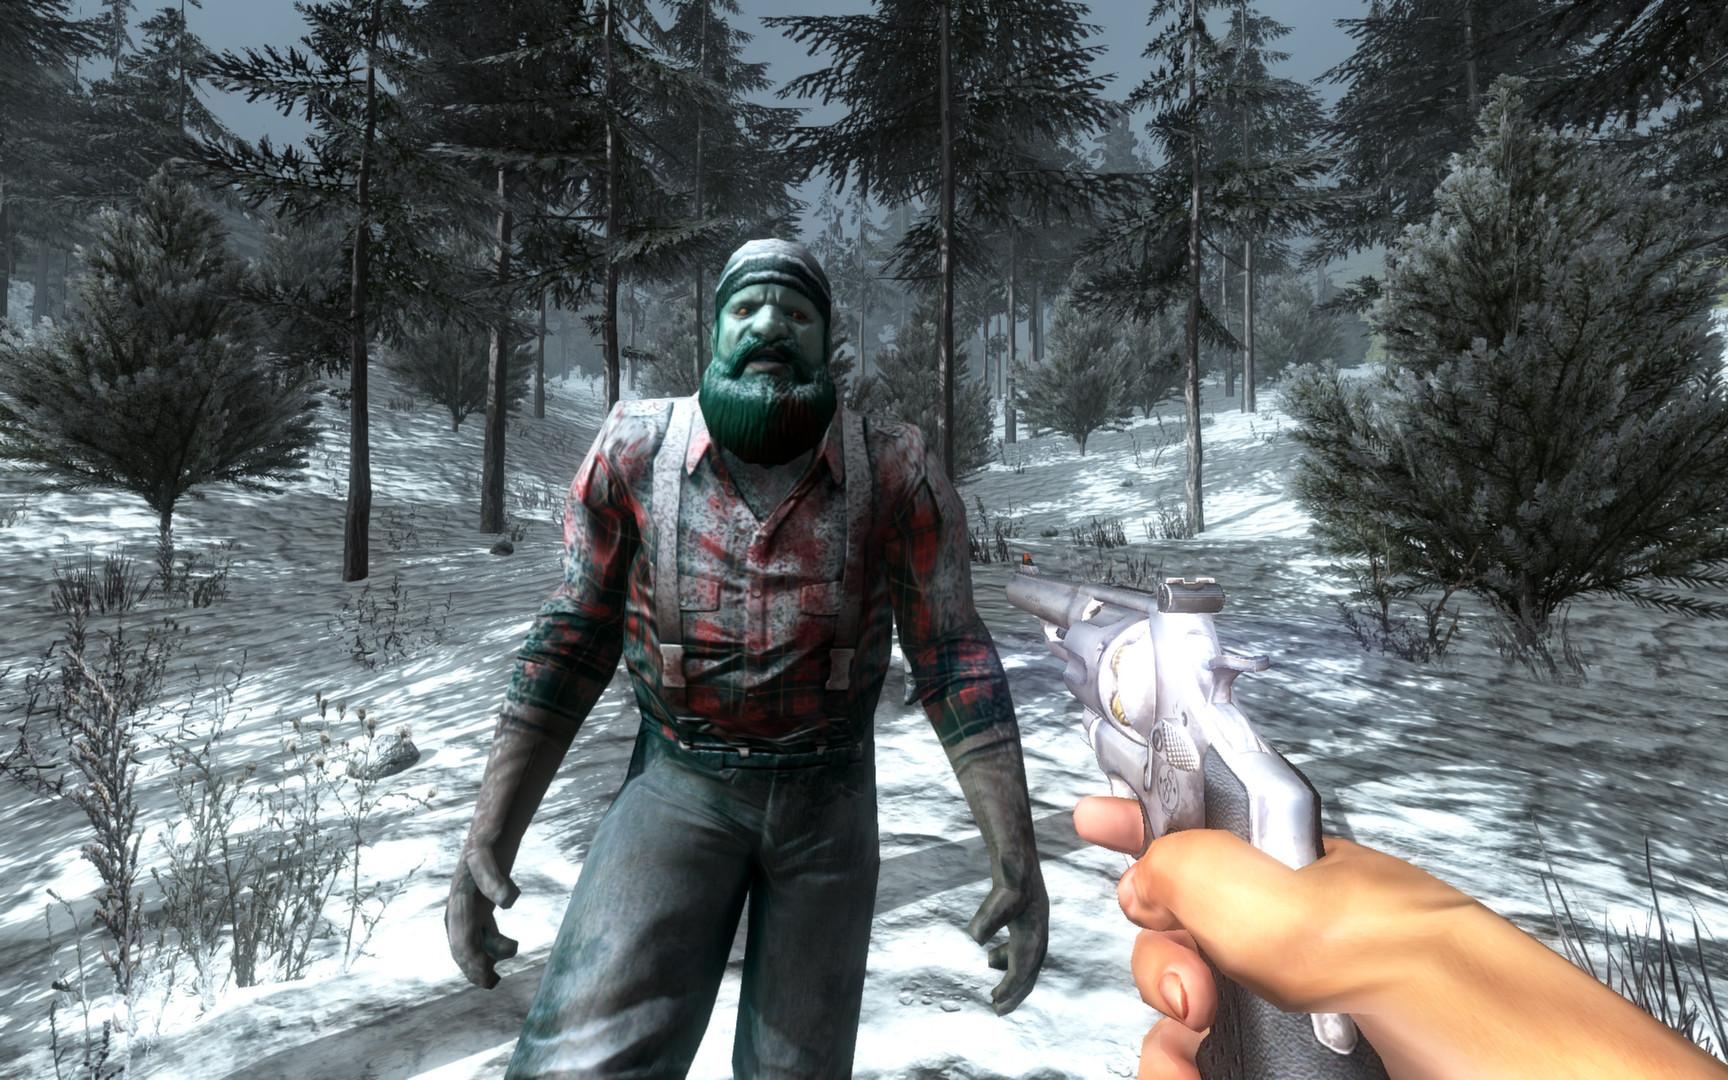 Game Engines – crookedartsalex